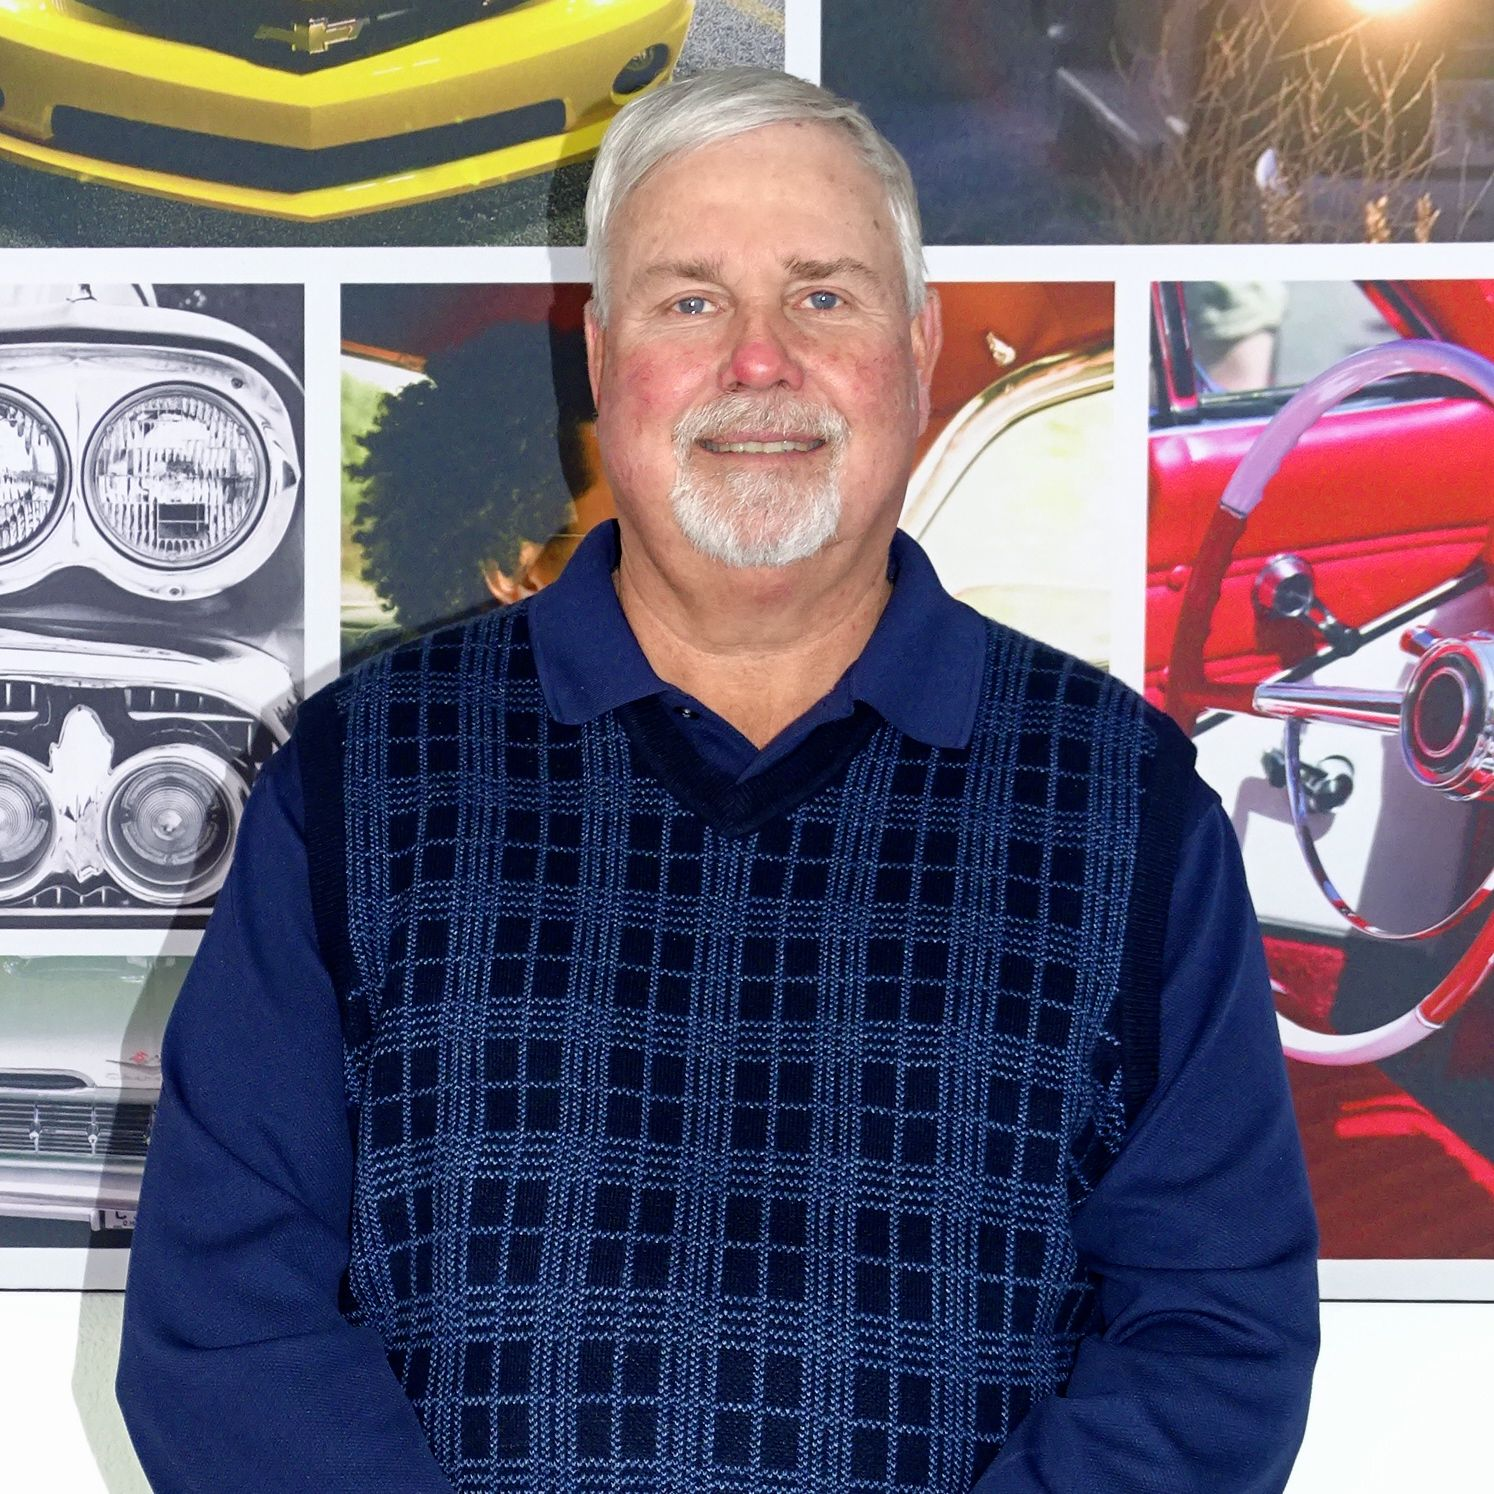 Thomas motors is a moberly buick cadillac chevrolet gmc for Thomas motors moberly mo